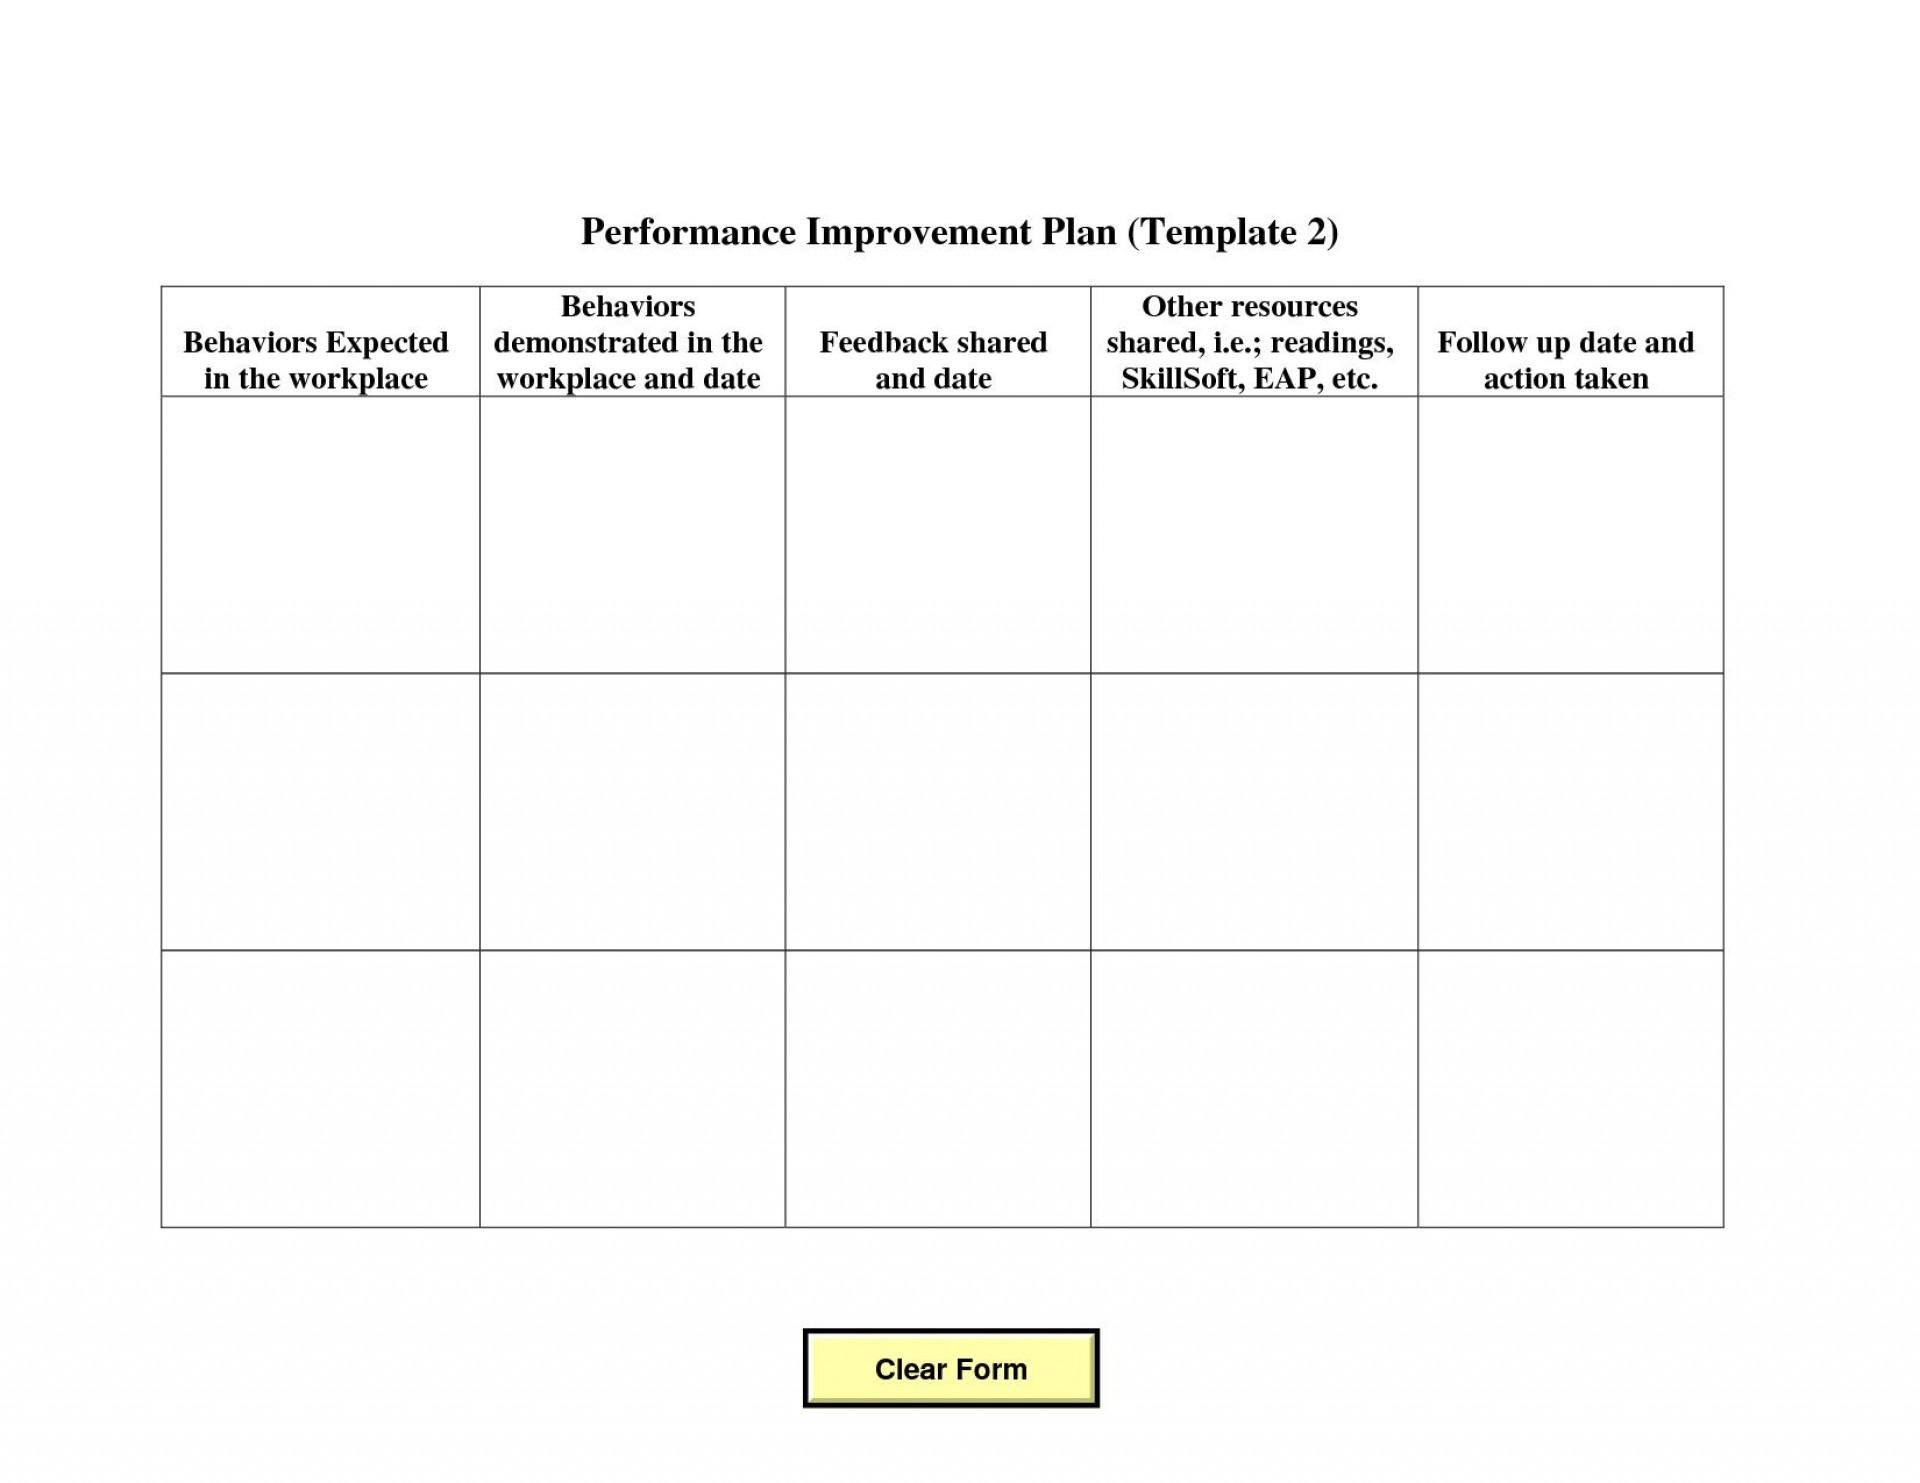 006 Singular School Improvement Planning Template Photo  Templates Plan Sample Deped 2016 Example South Africa1920